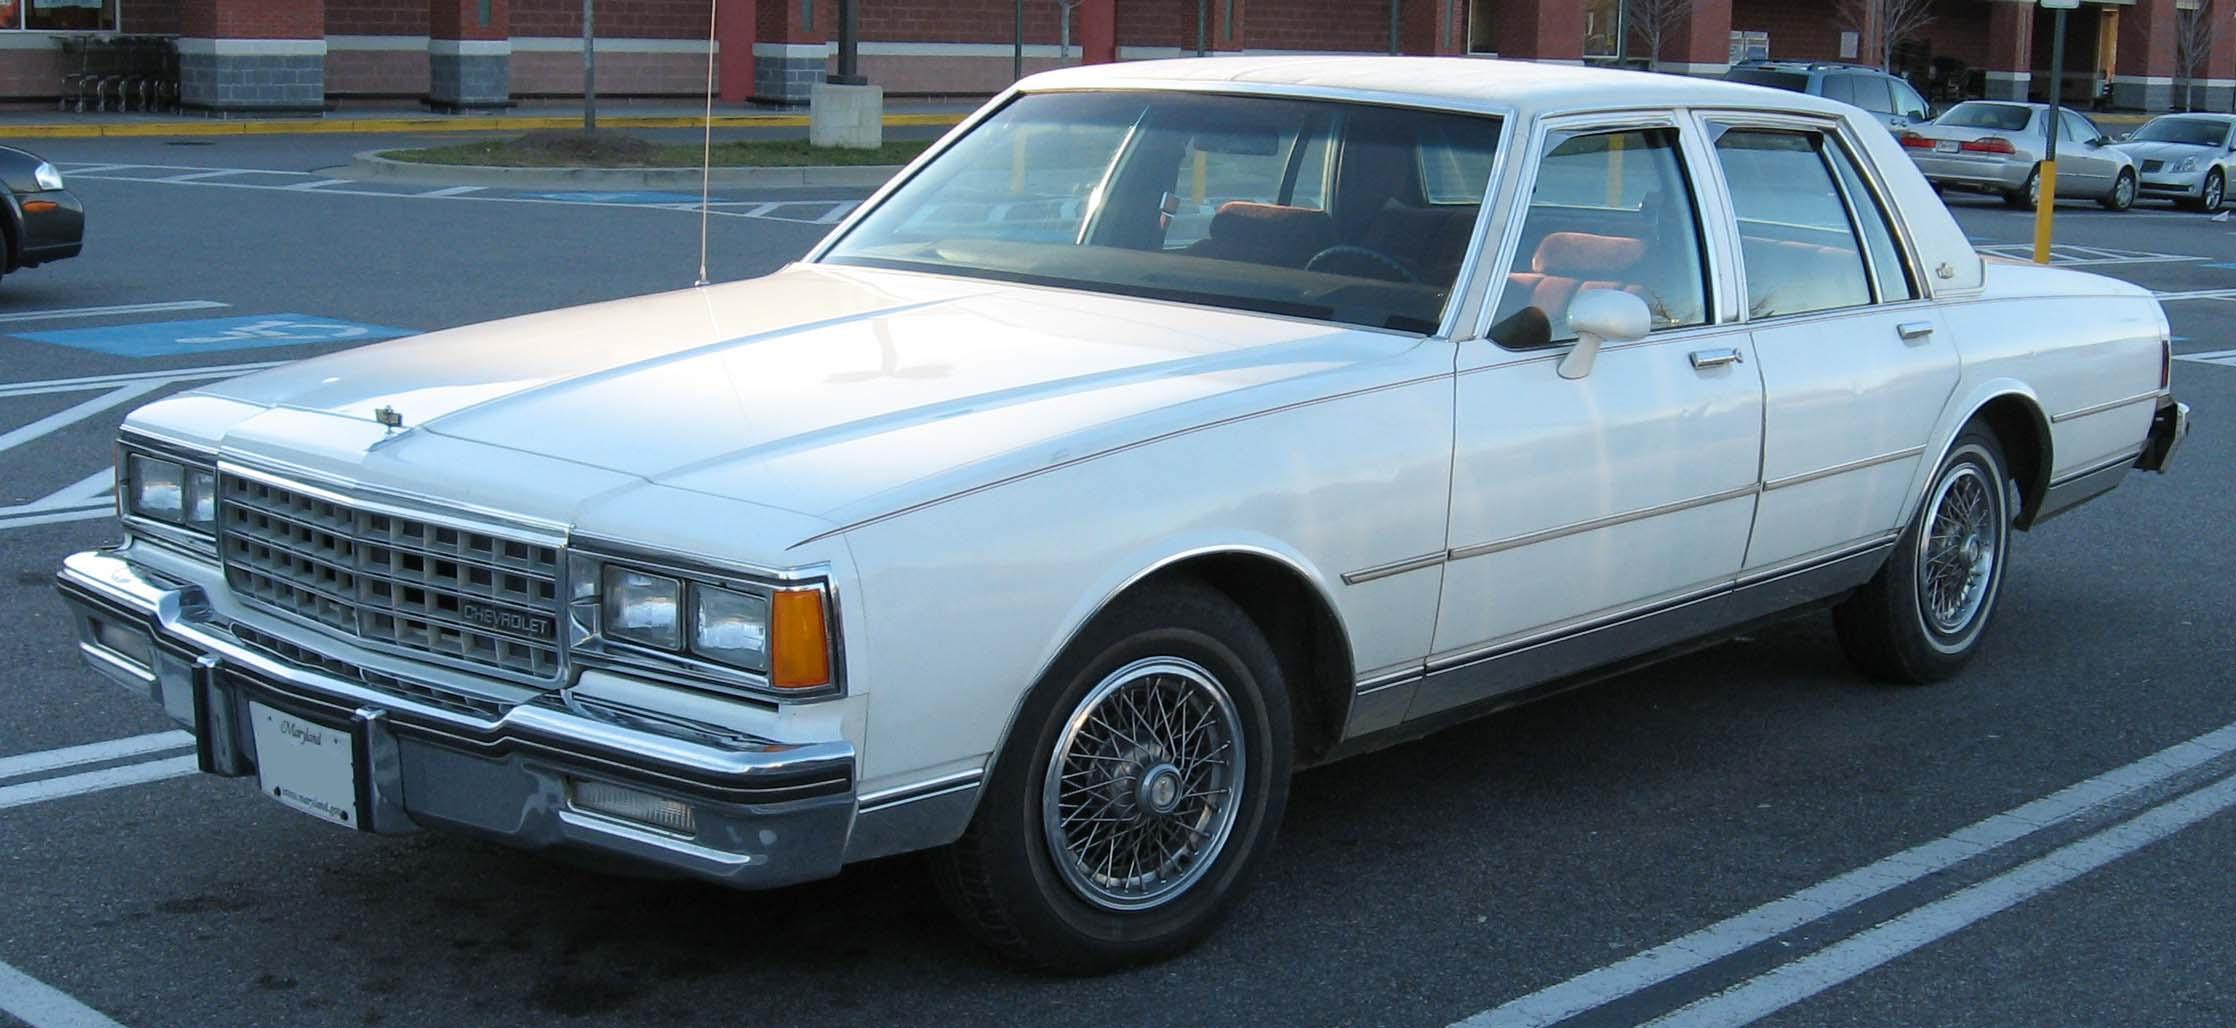 Maisto Muscle Machines 1958 Chevy Impala also 3083 2005 Chevrolet Impala 8 besides 3083 2005 Chevrolet Impala 10 further 2005 chevy impala cream puff 33cc37566ff6ef29109c additionally 1991 Camaro Z28 Recovered Reborn. on 2005 chevy impala